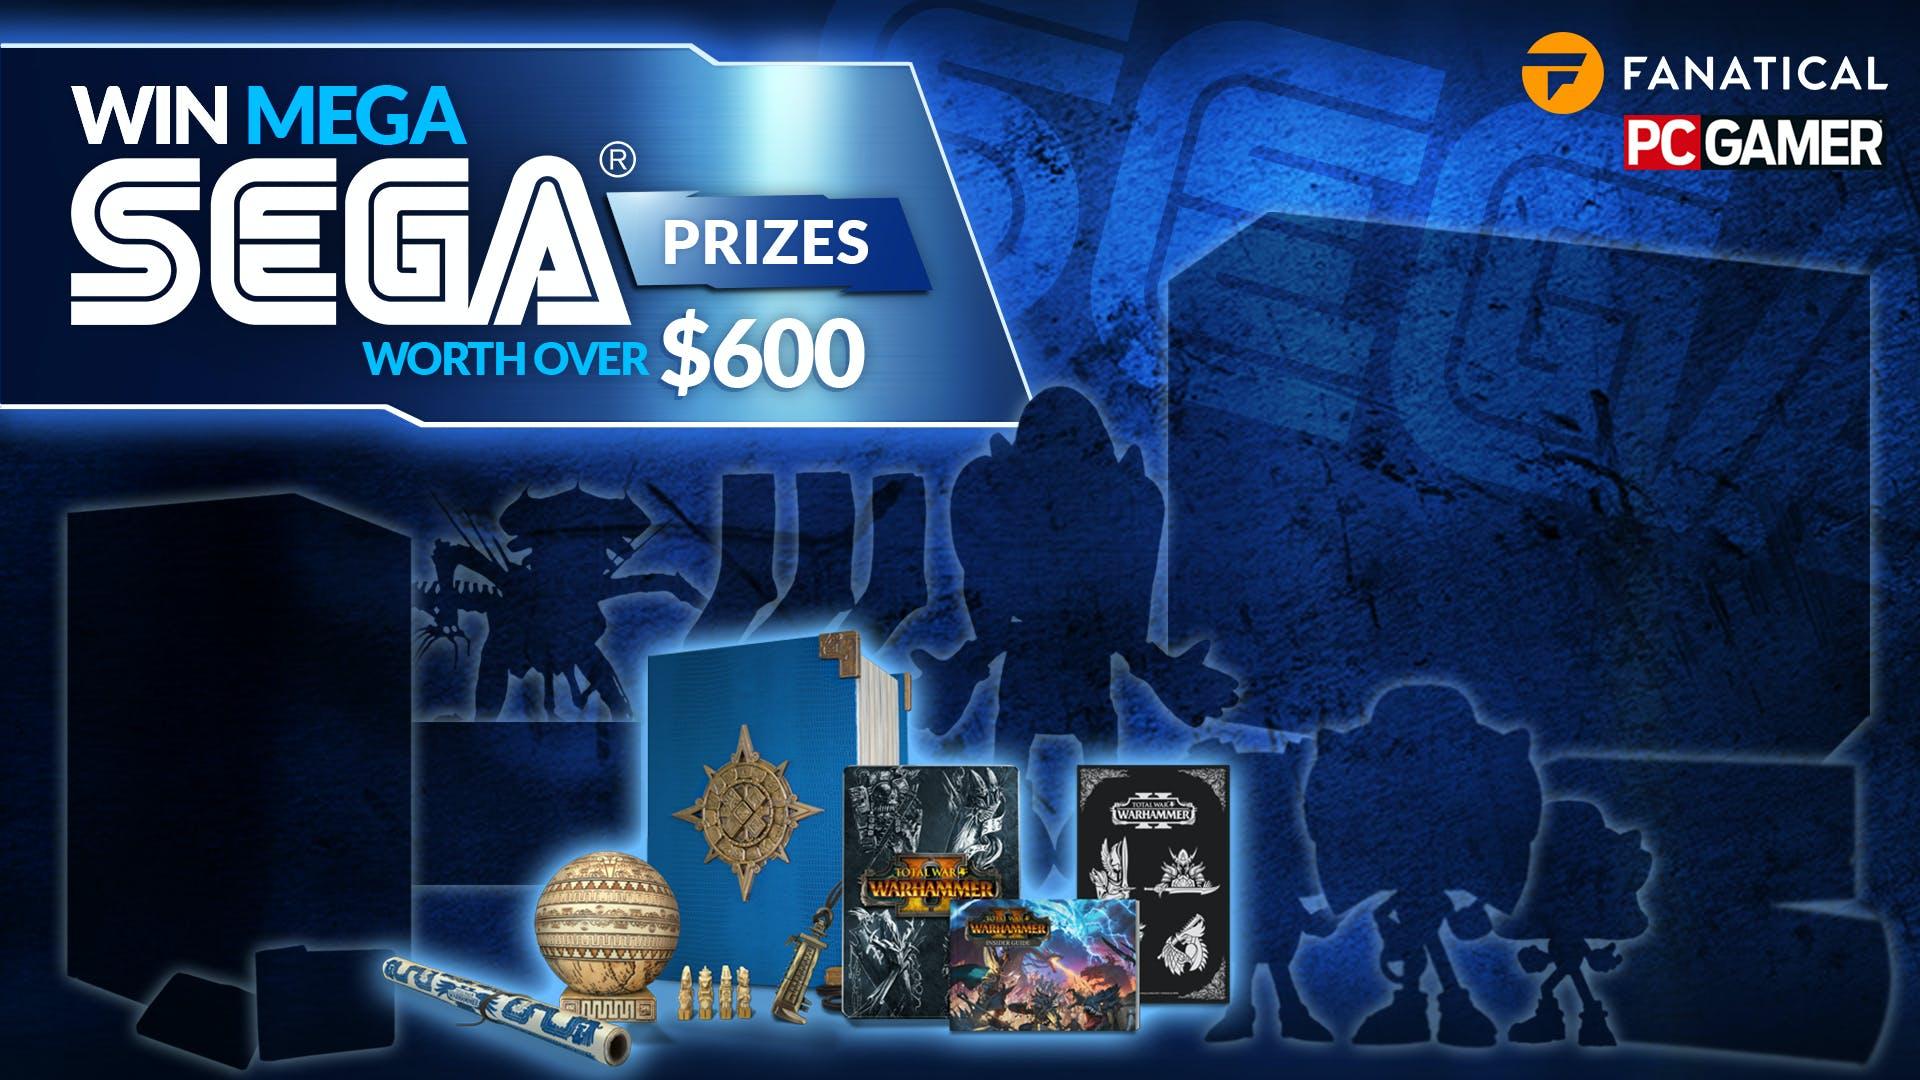 https://images.prismic.io/fanatical/a3112d6251c24c13e136524304f54fb8a6a3e1c0_sega-contest-cover-prizes-day01-1.jpg?auto=compress,format